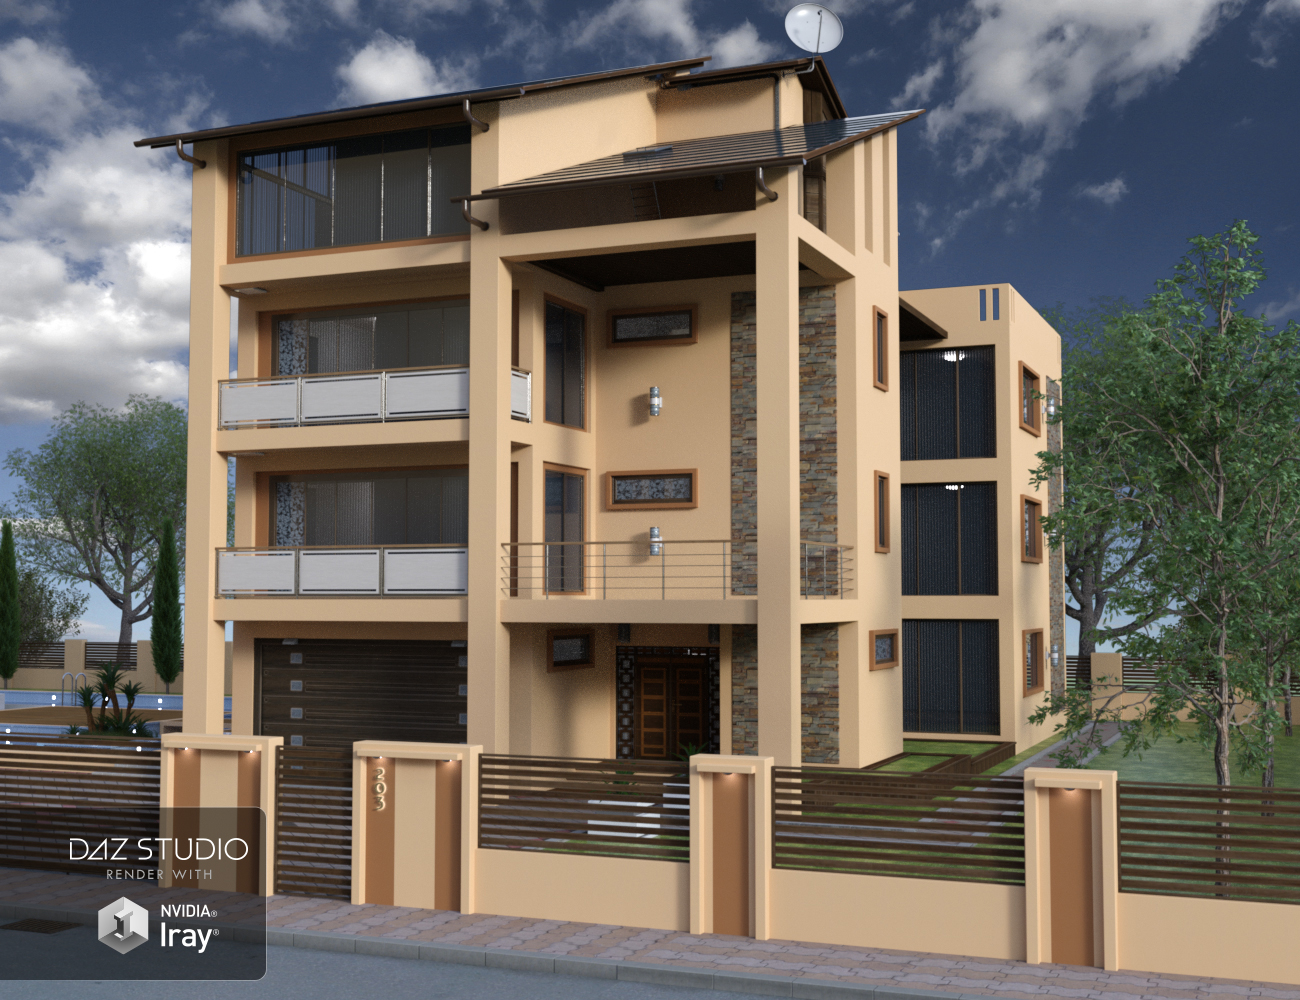 Modern House 2 by: petipet, 3D Models by Daz 3D